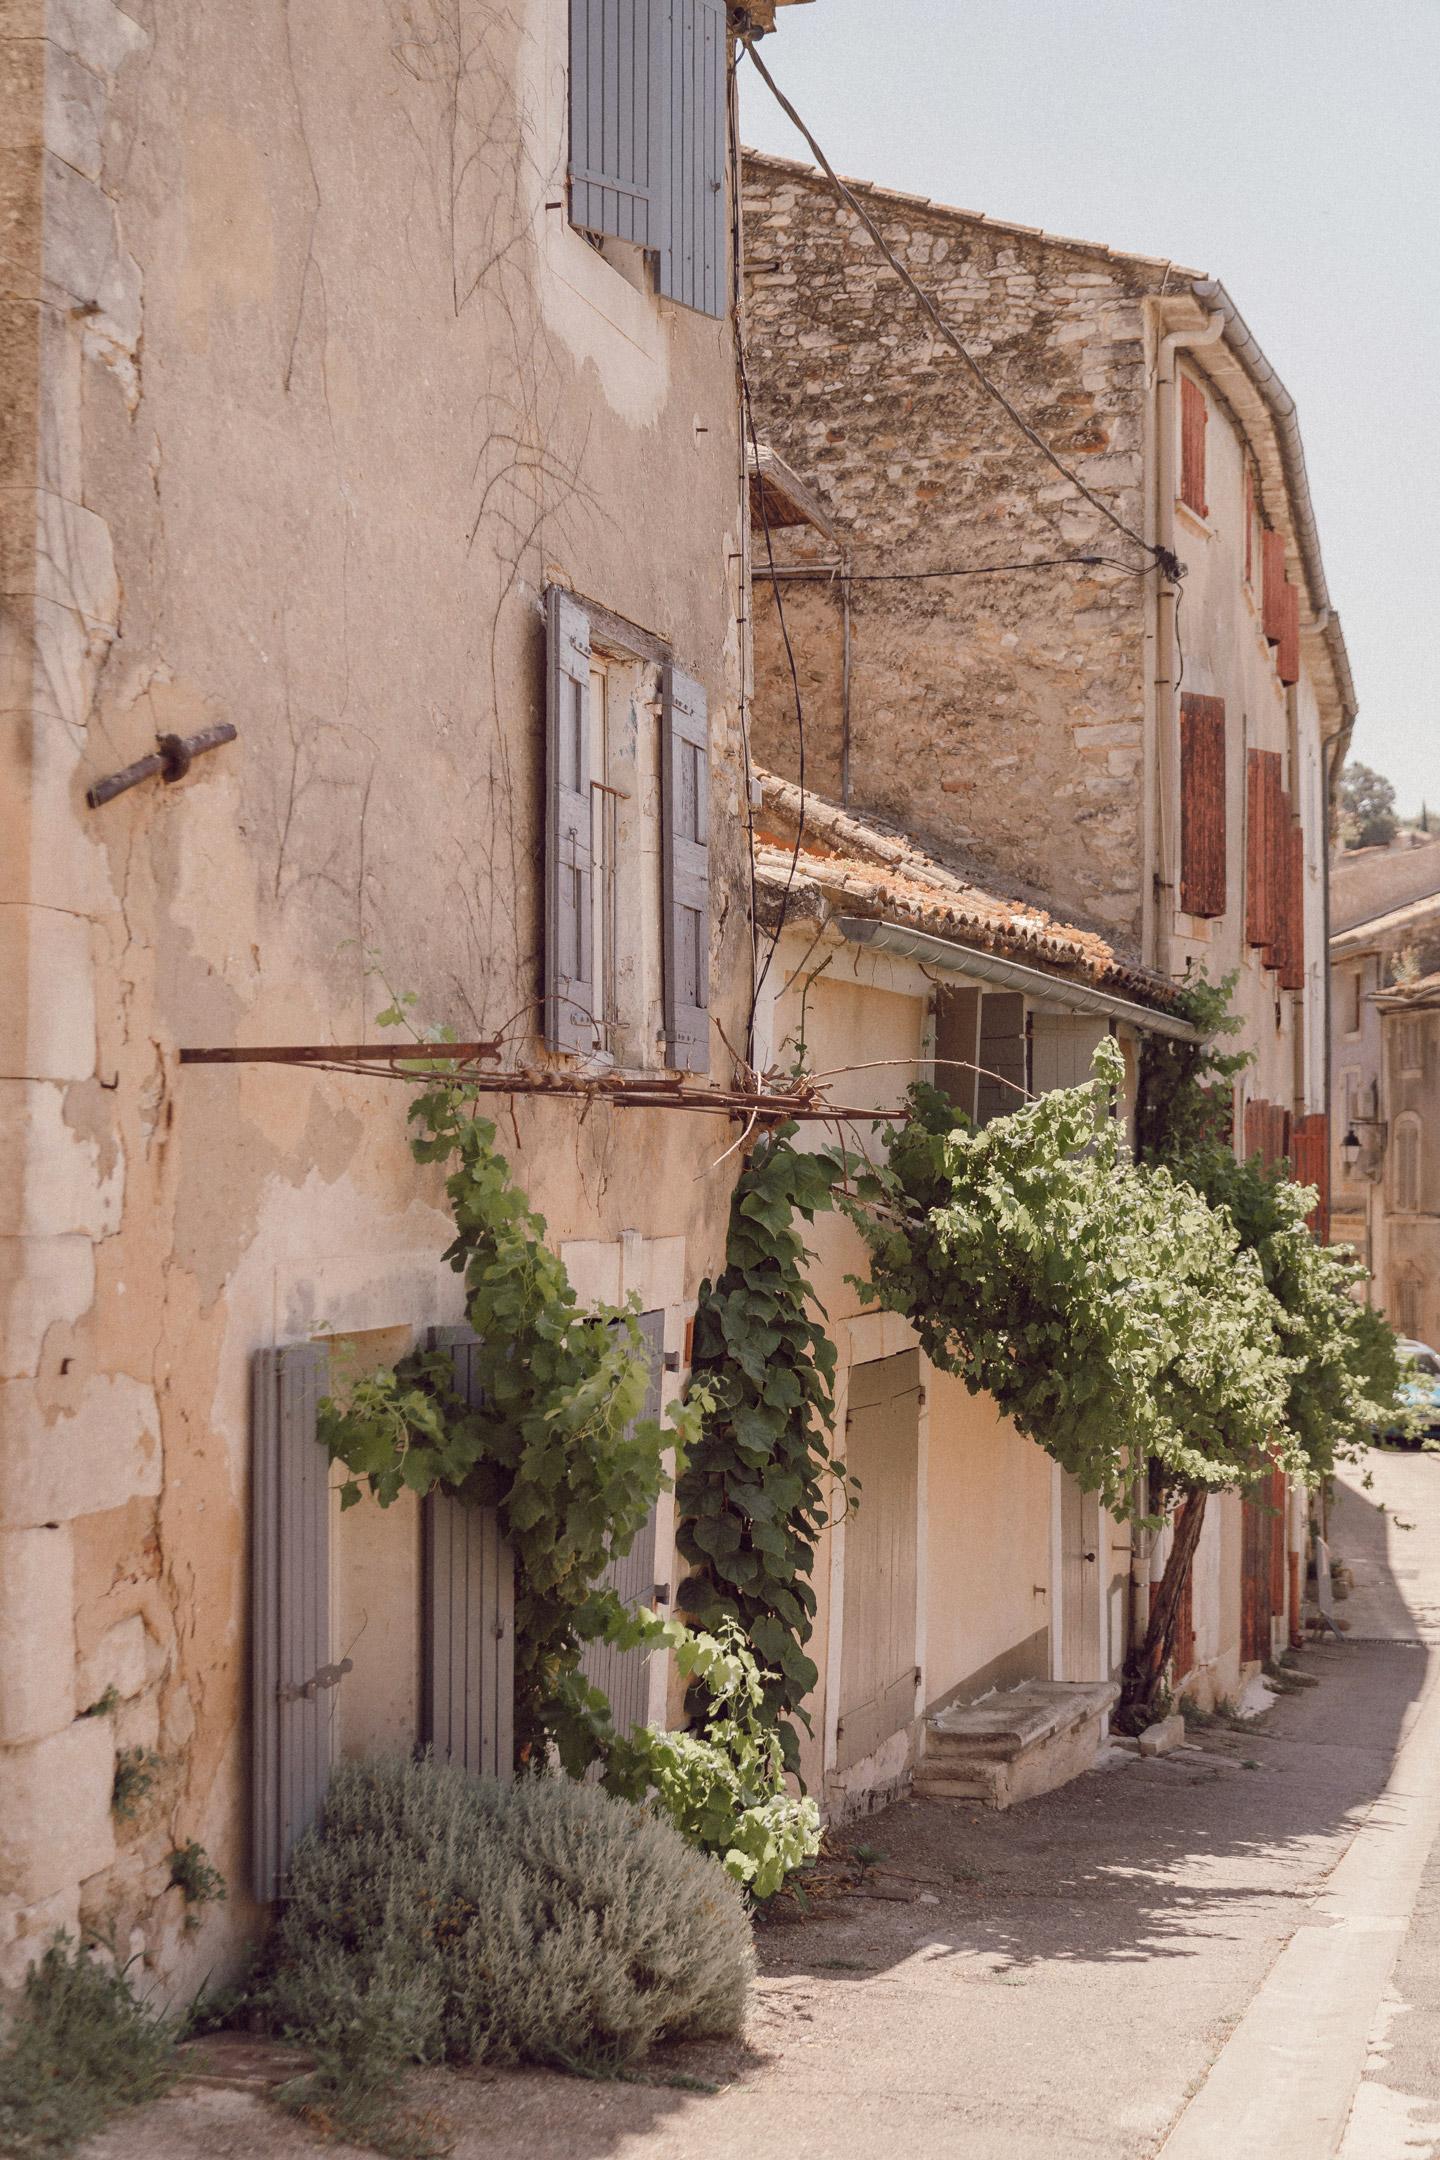 provence-menerbes-oppede-isle-sur-la-sorgue-30